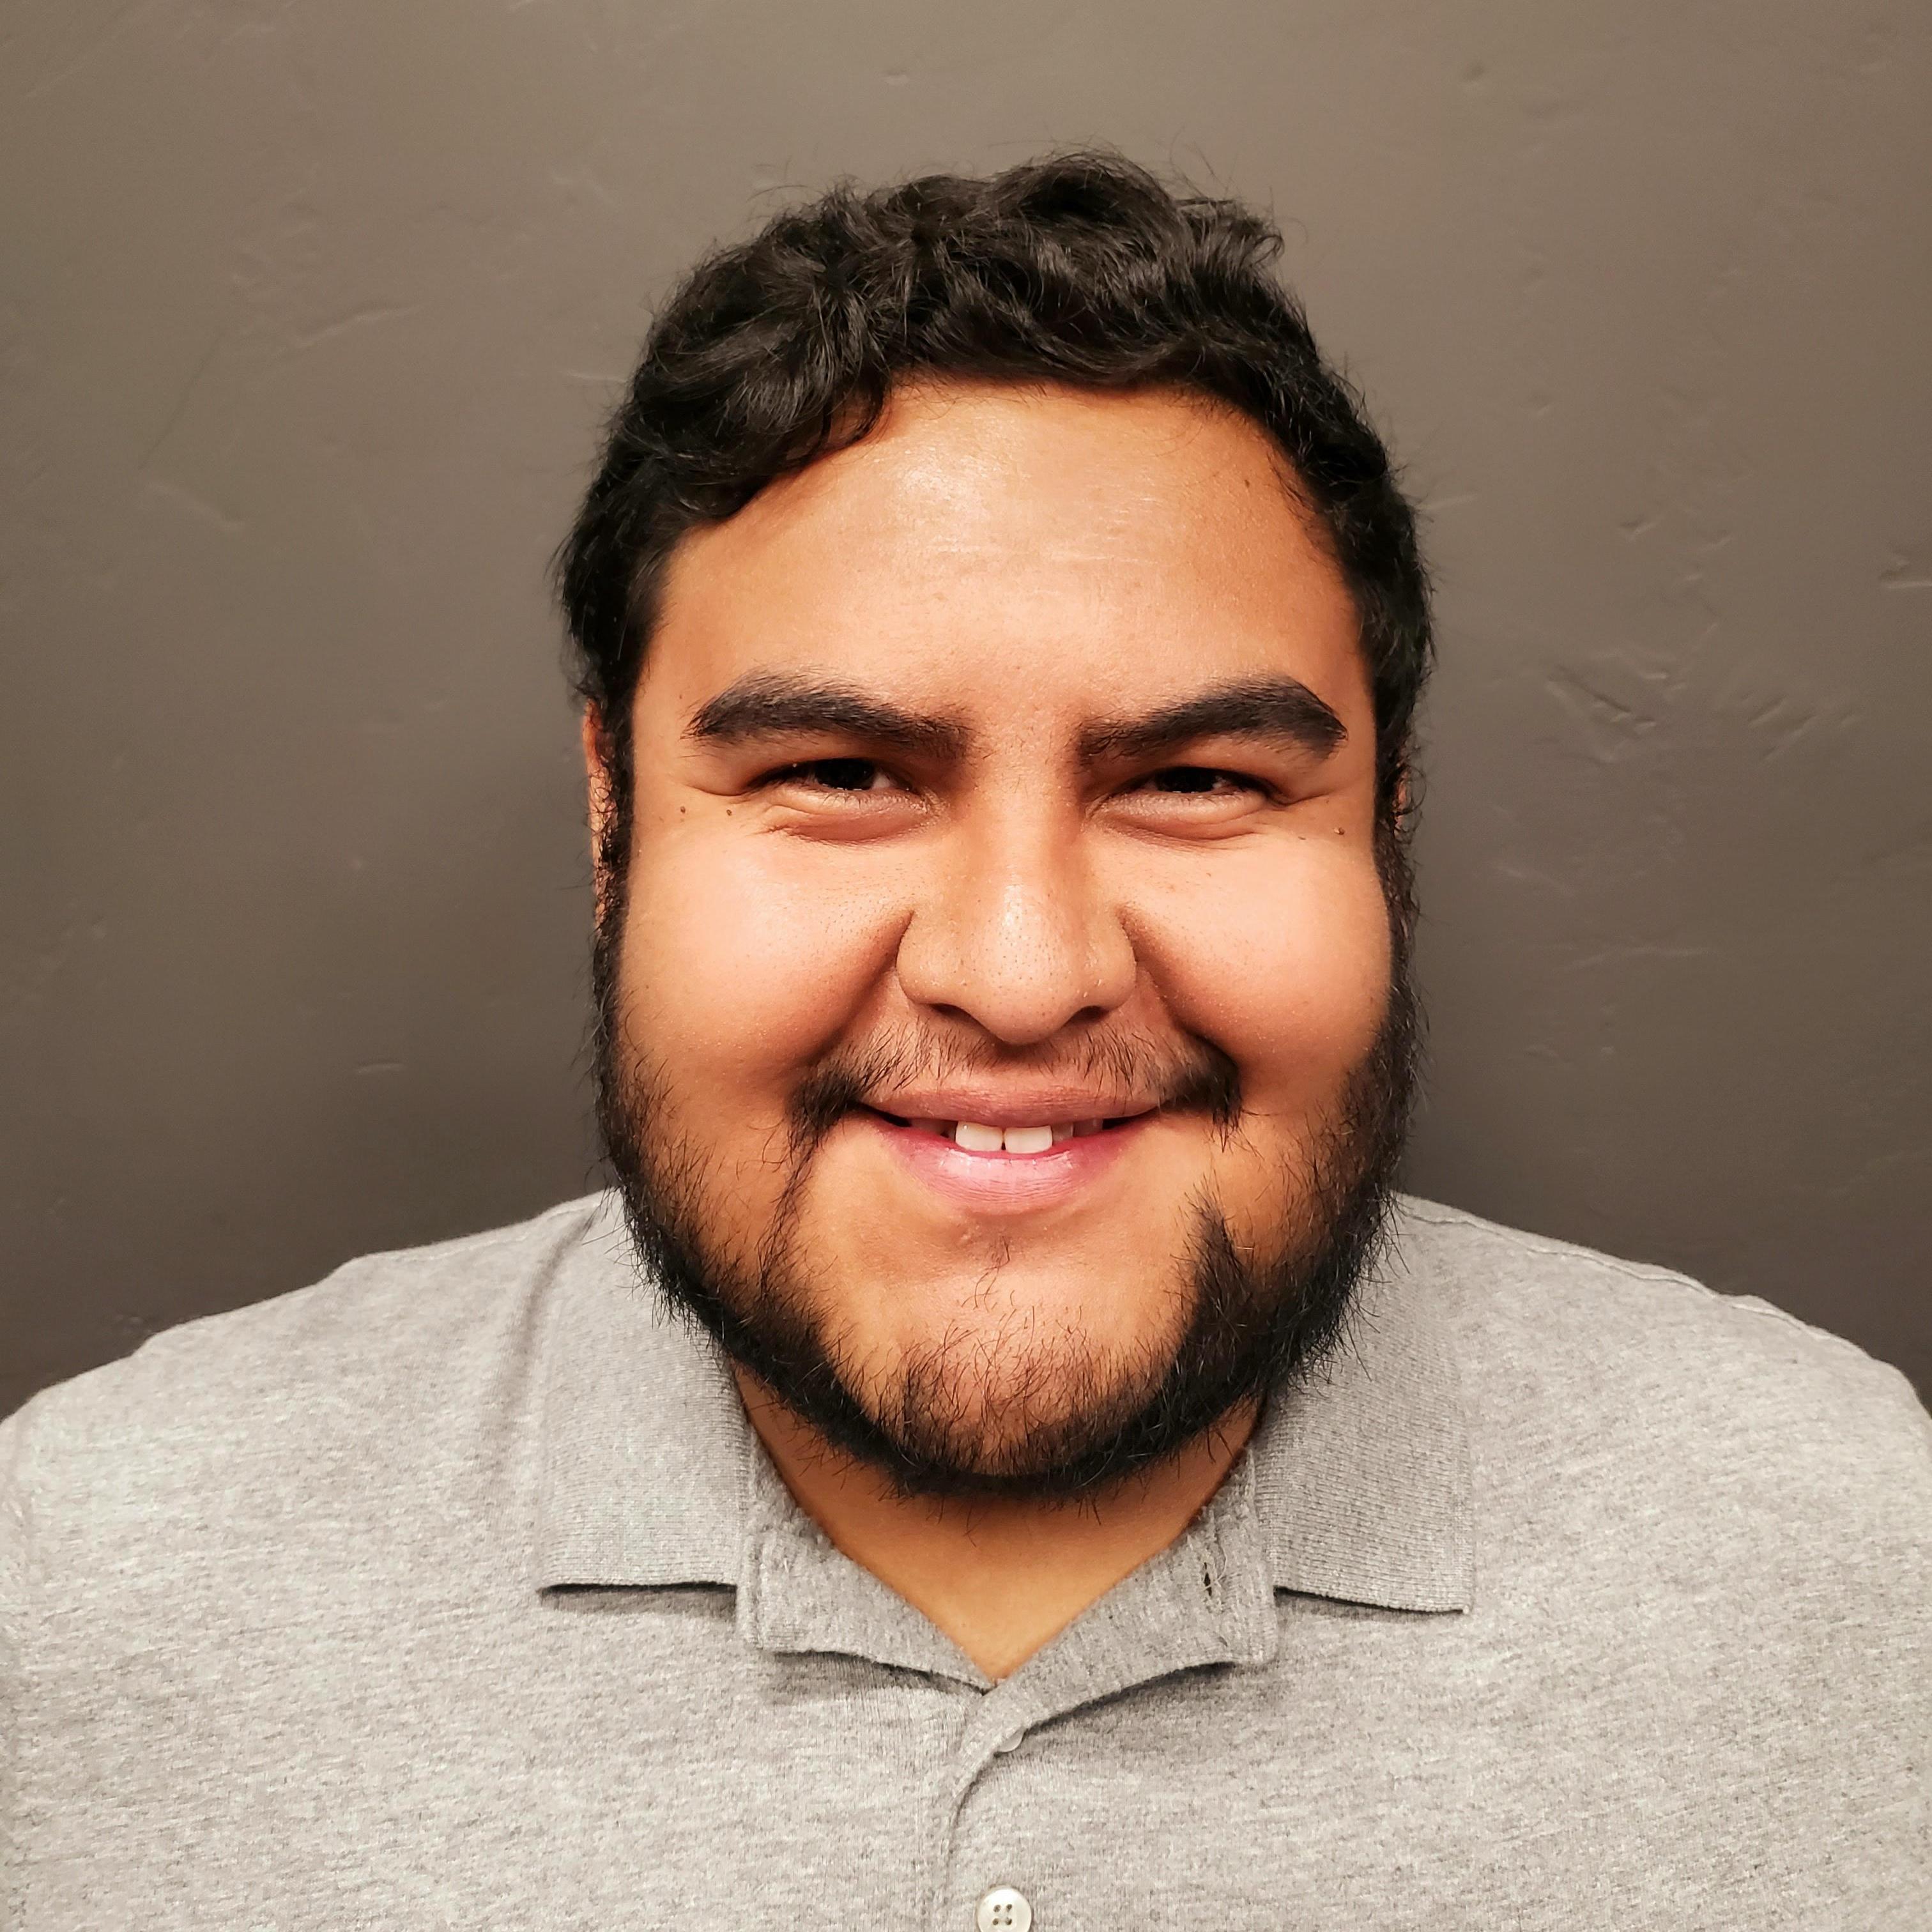 Guillermo Keymolent's Profile Photo